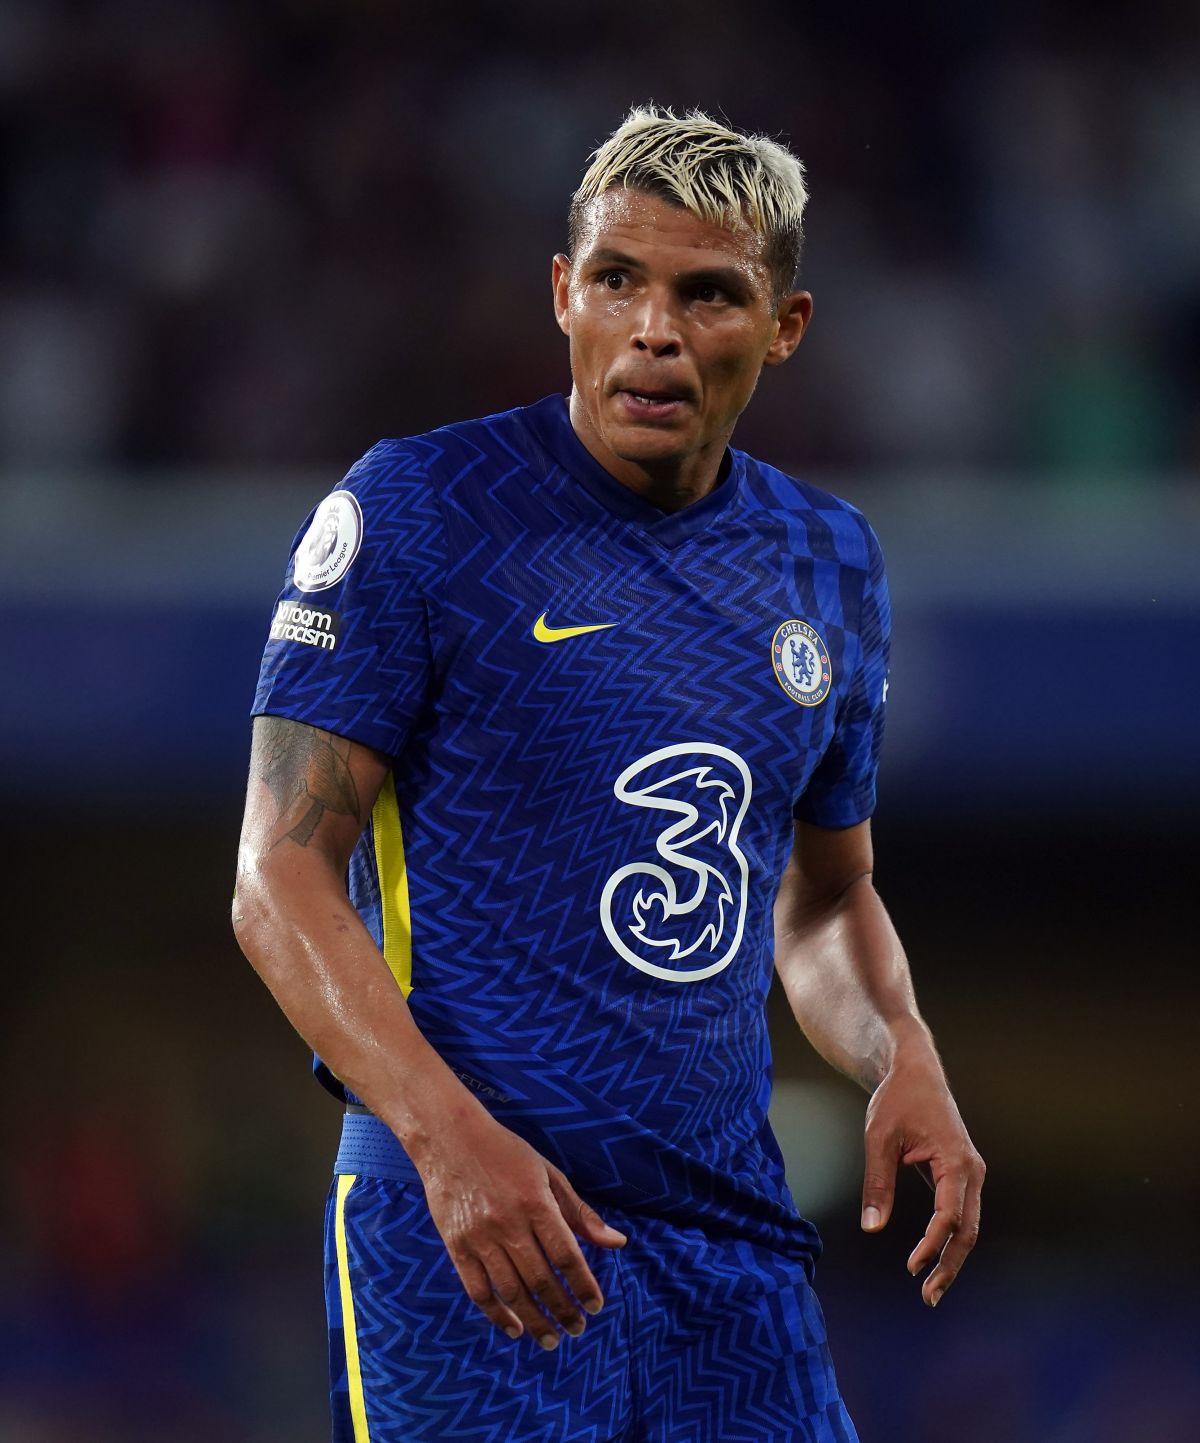 Thomas Tuchel says age is not key factor in Thiago Silva's future